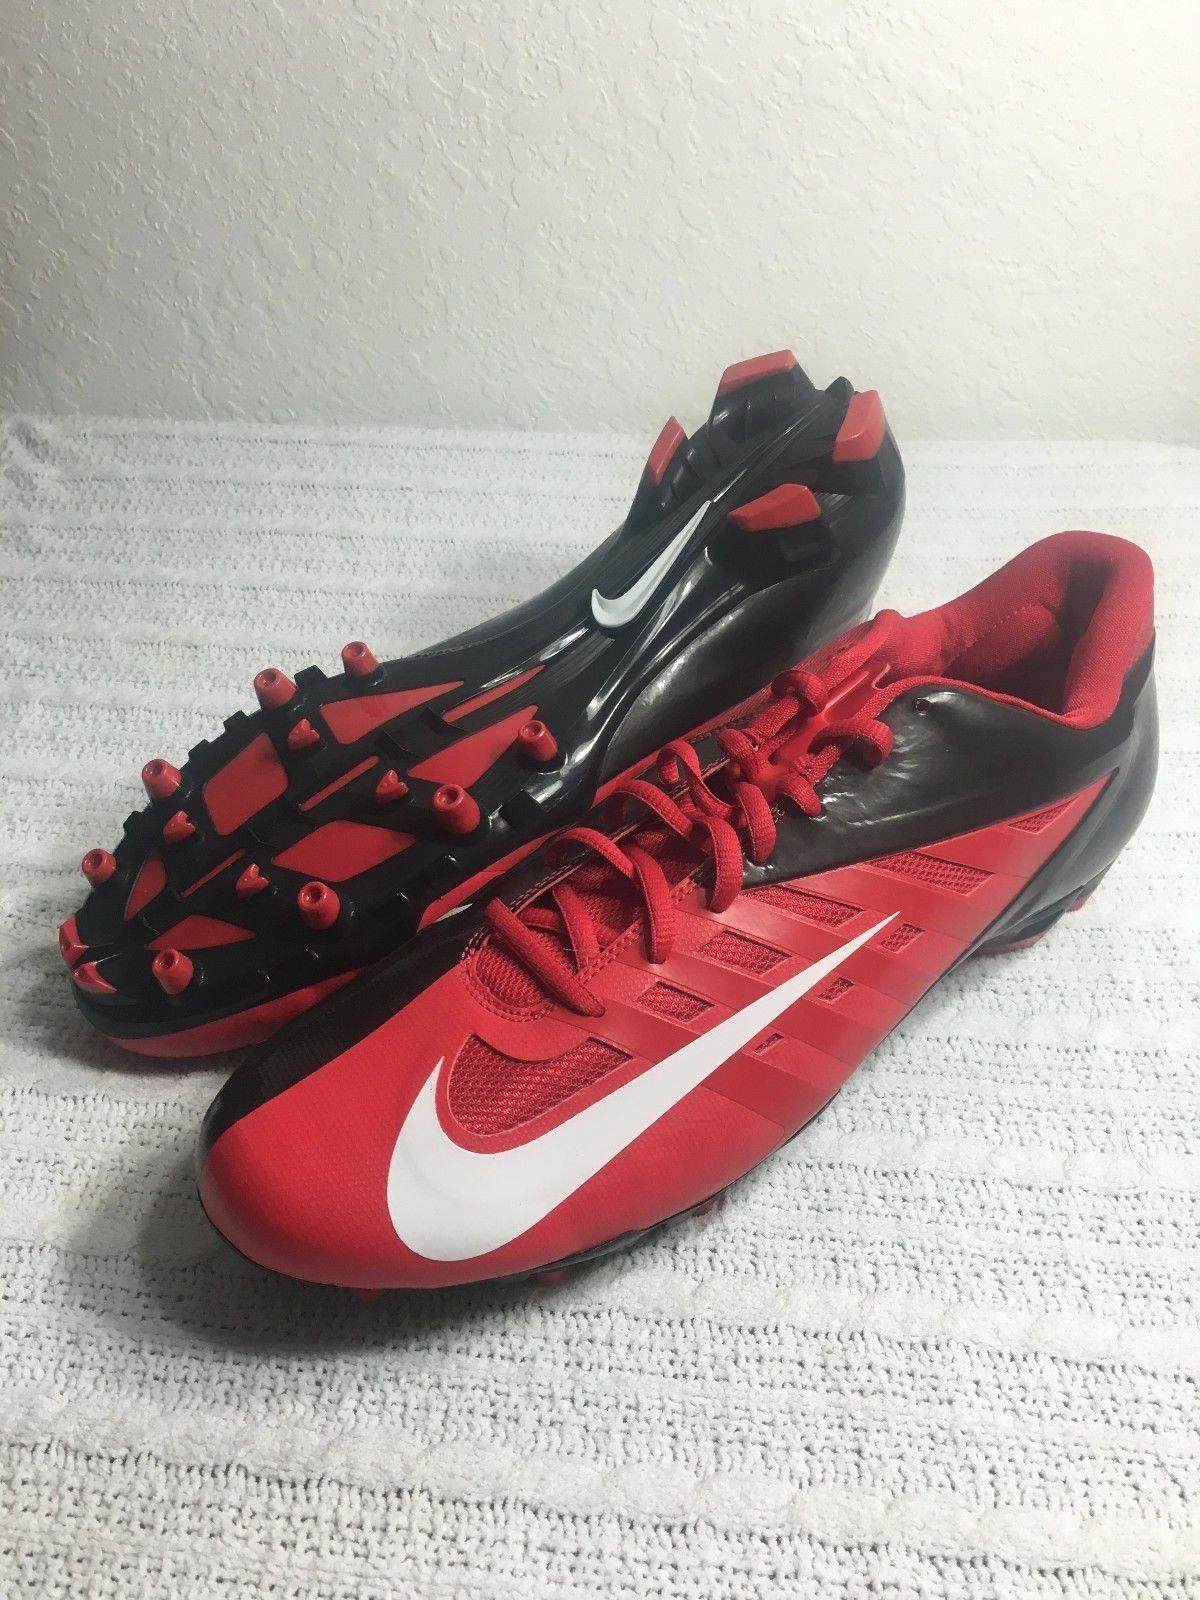 143ff6b5e02 NIKE VAPOR PRO LOW TD FOOTBALL CLEATS RED BLACK MEN SIZE 14 NEW 534770 602